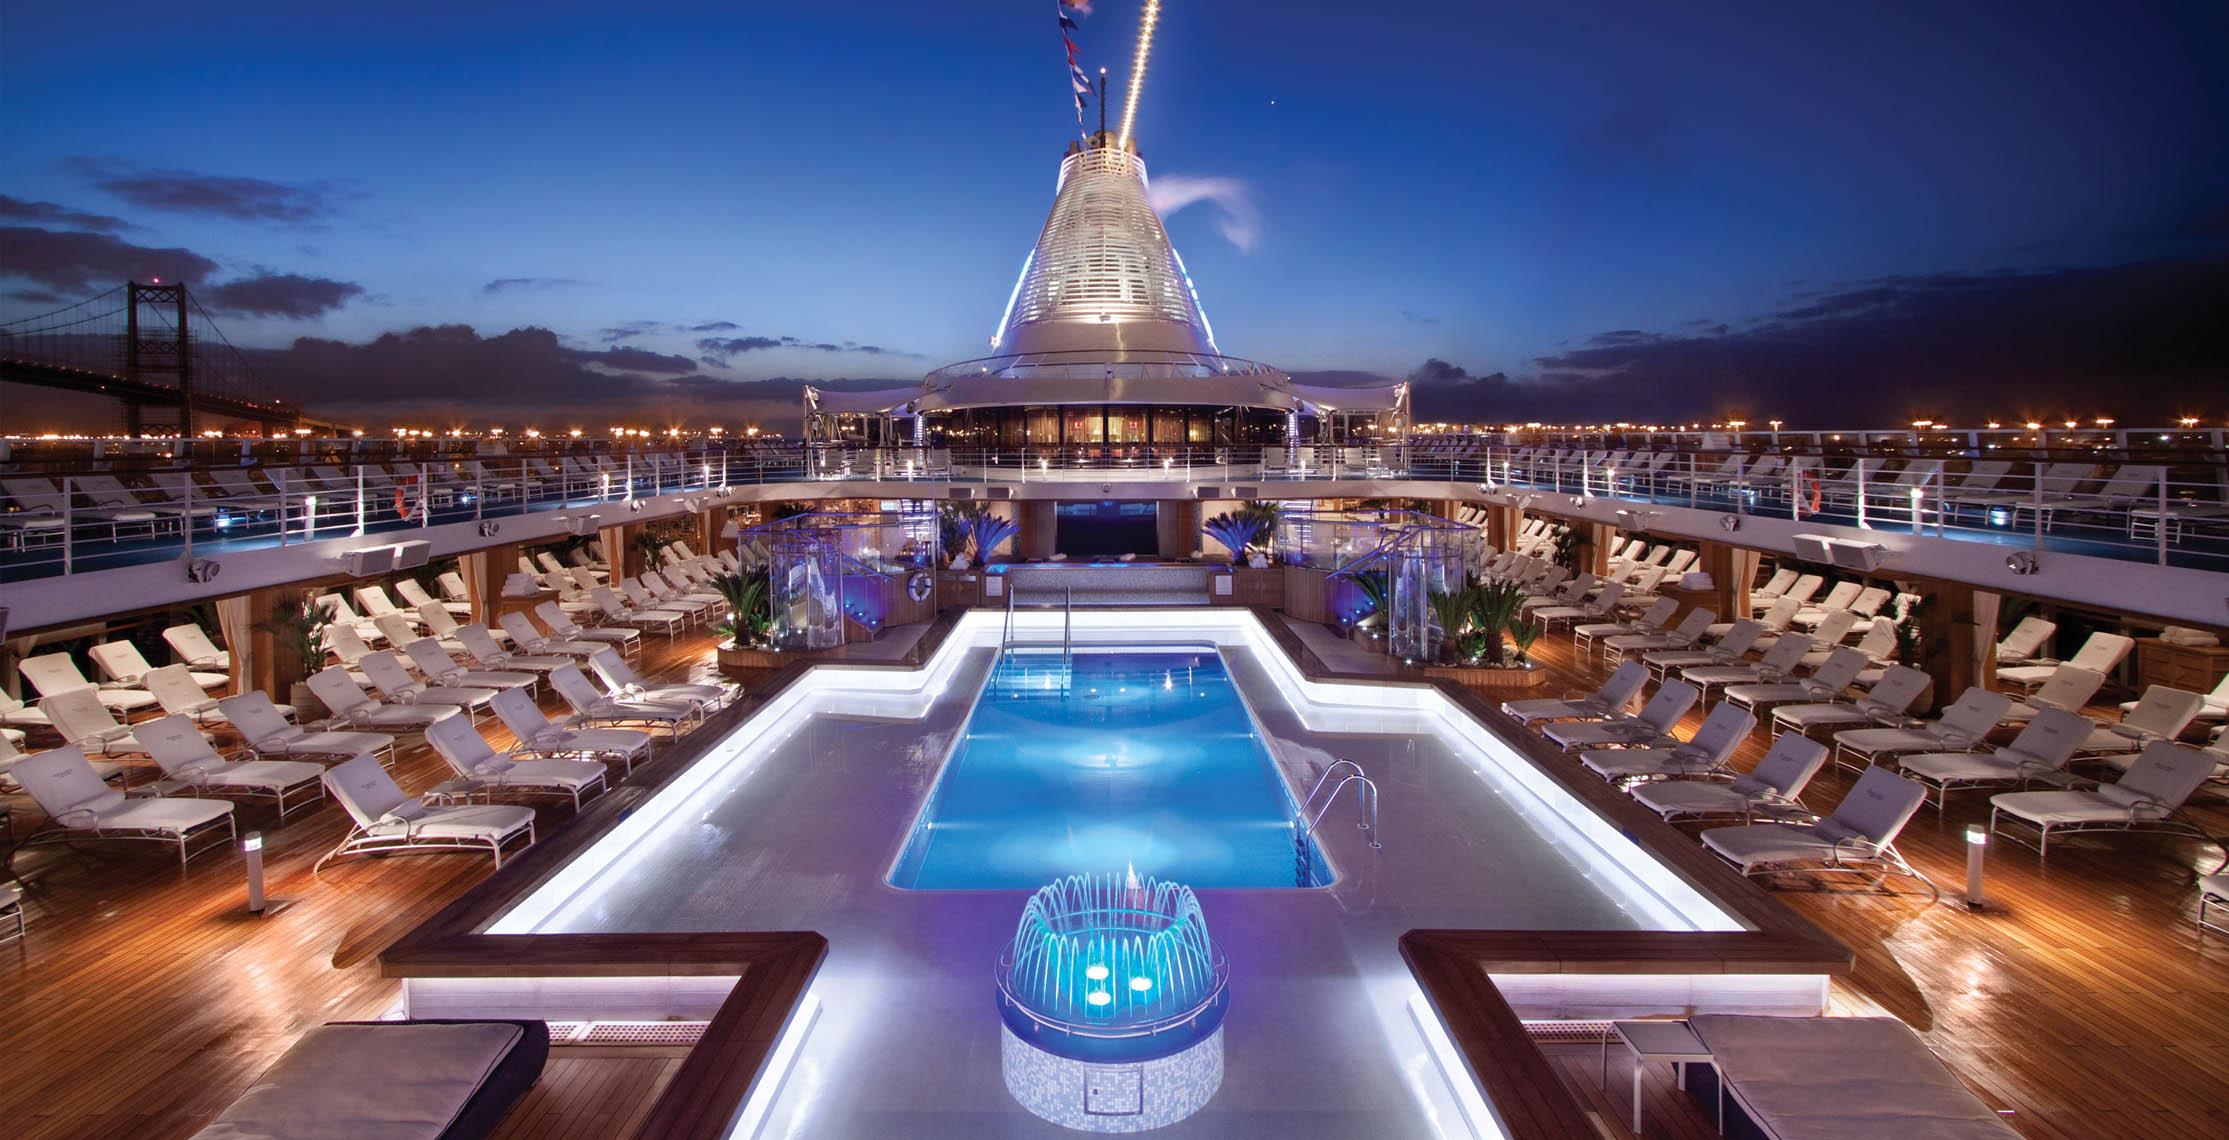 Pre-Cruise Savings with Oceania! 2